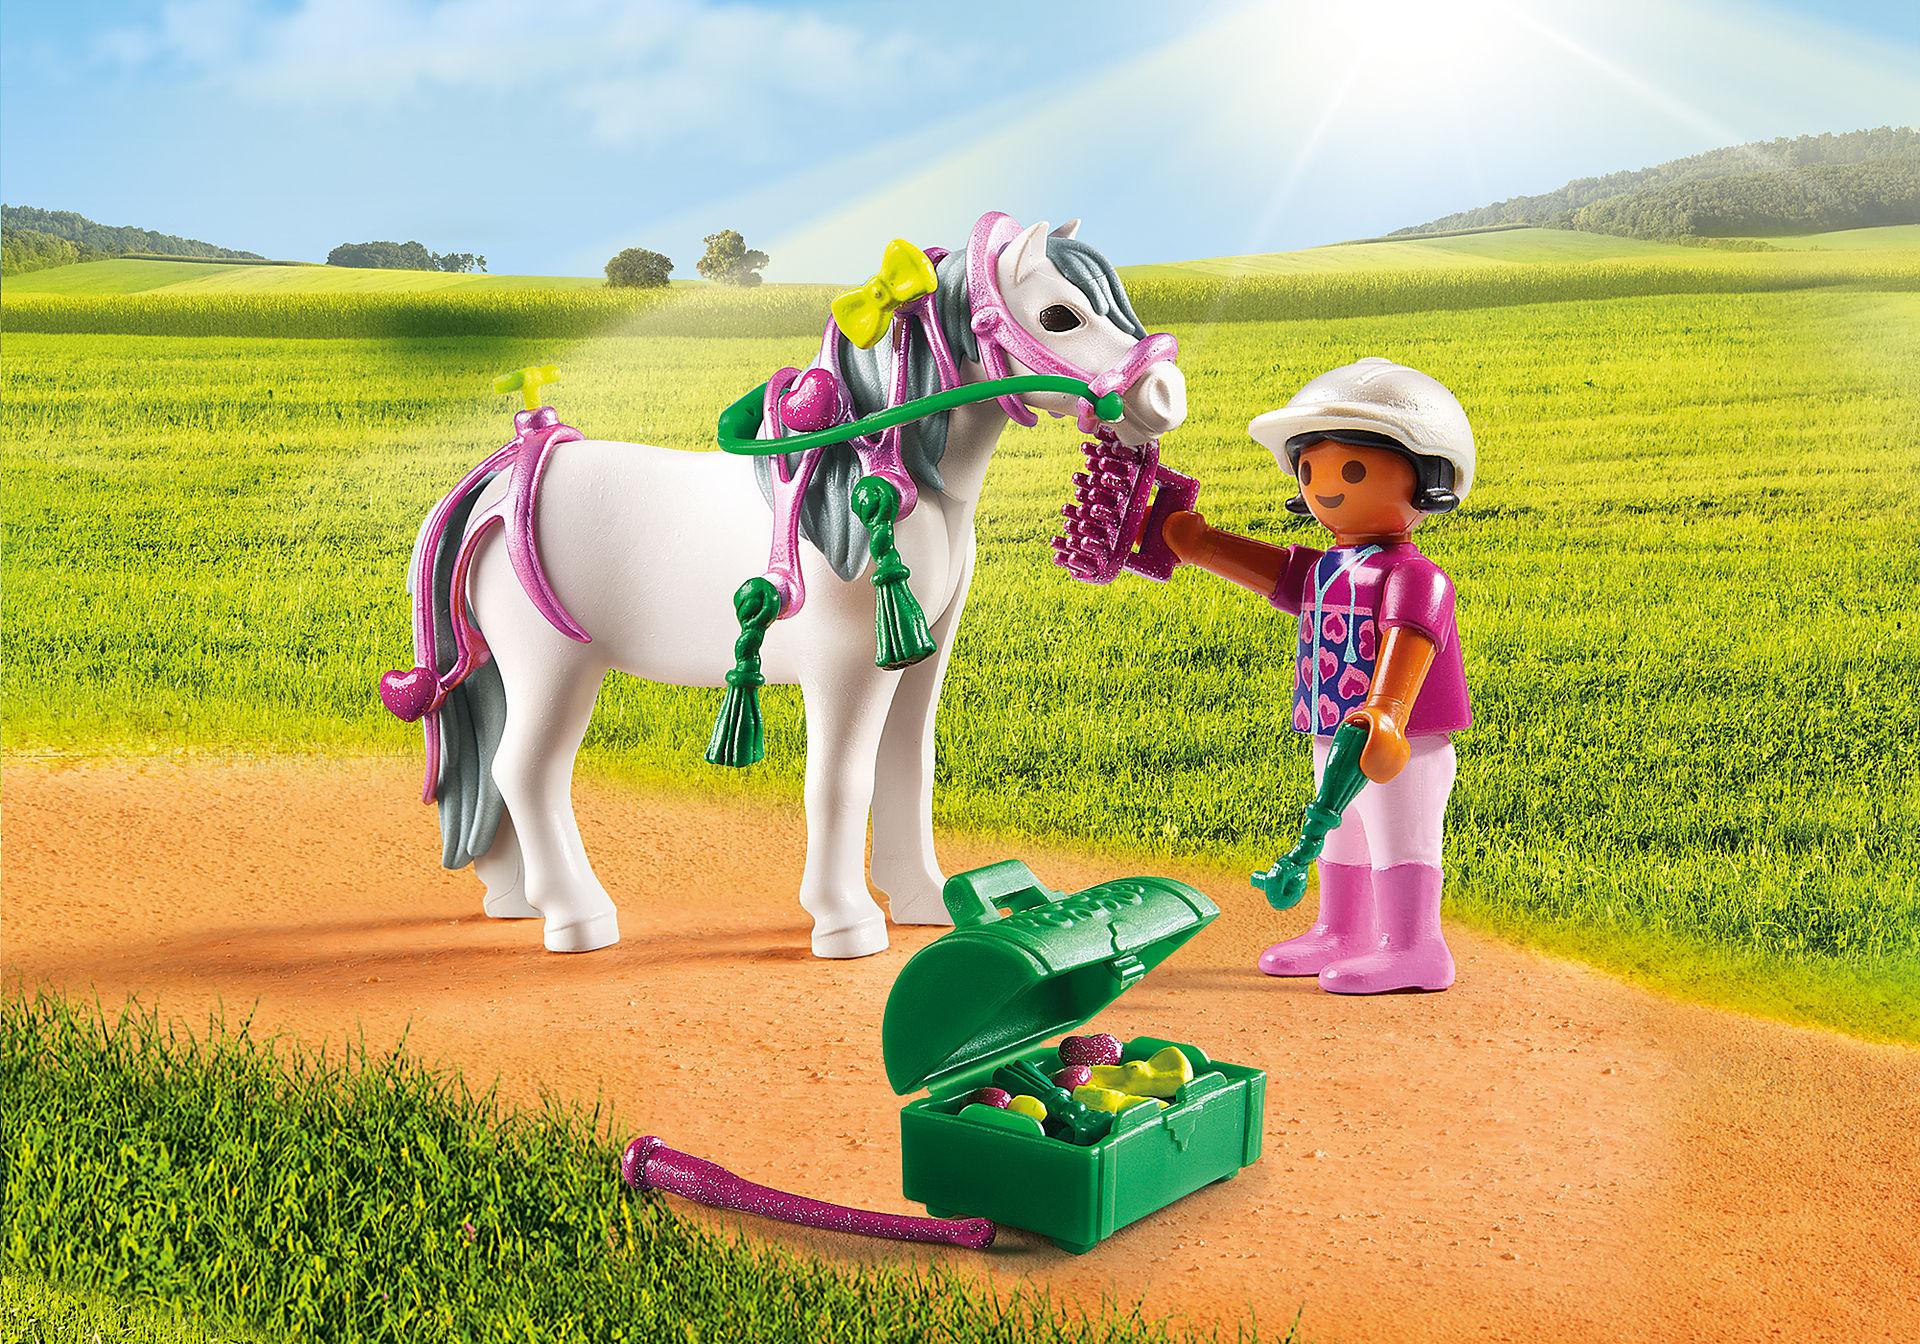 http://media.playmobil.com/i/playmobil/6969_product_detail/Groomer with Heart Pony